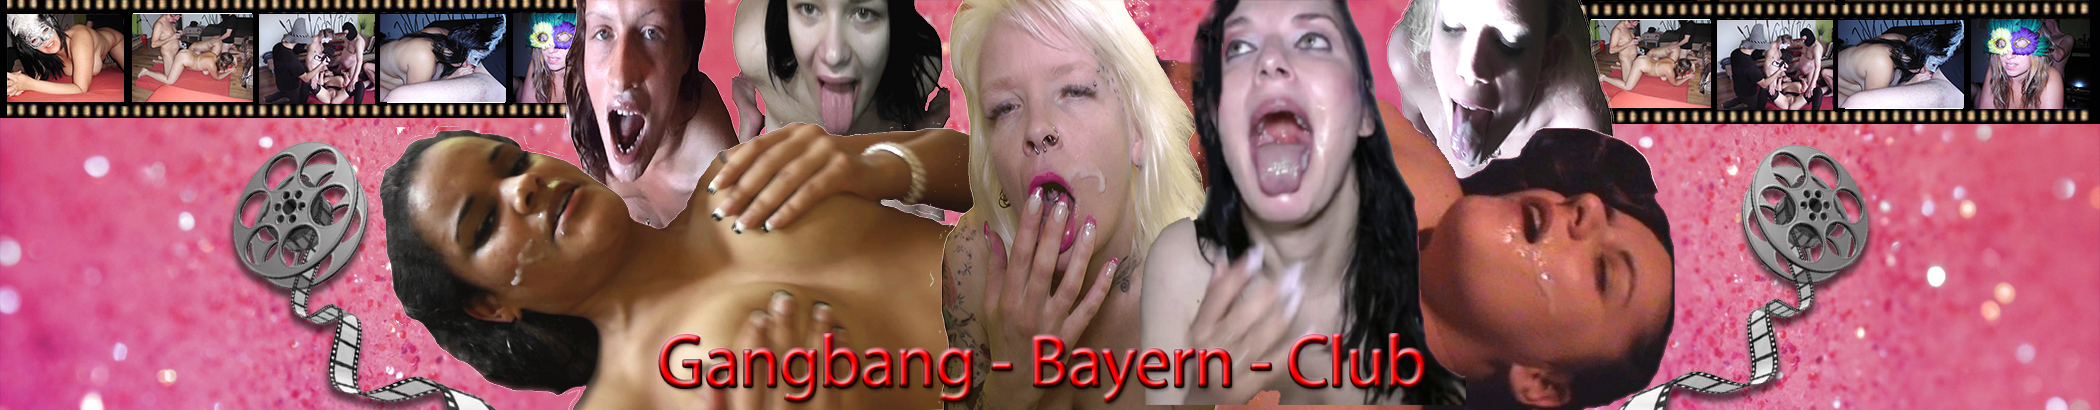 http://gangbang-bayern.net/header.jpg